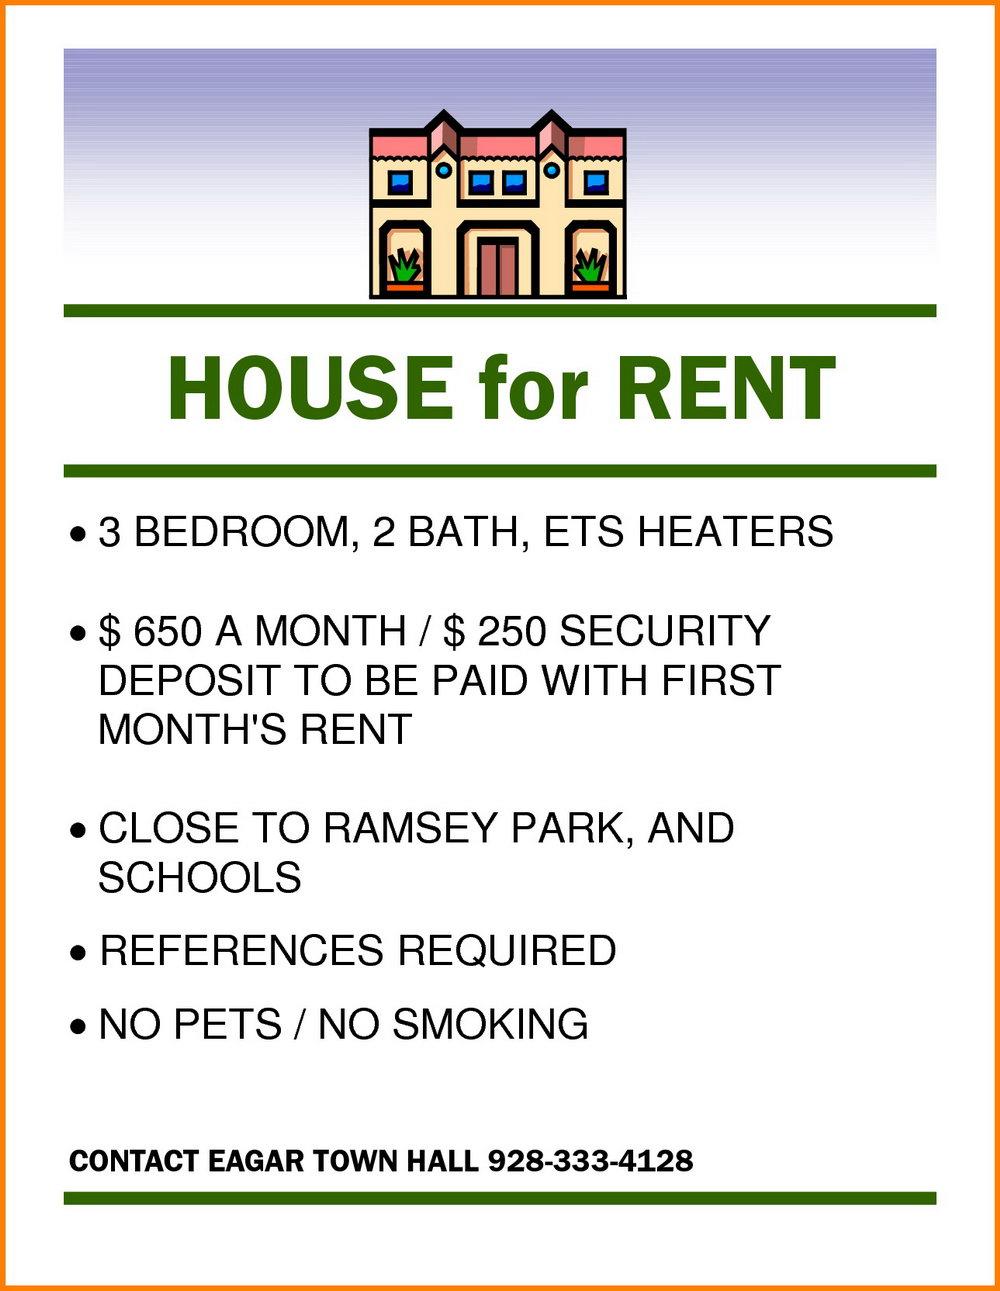 Rental Property Flyer Template